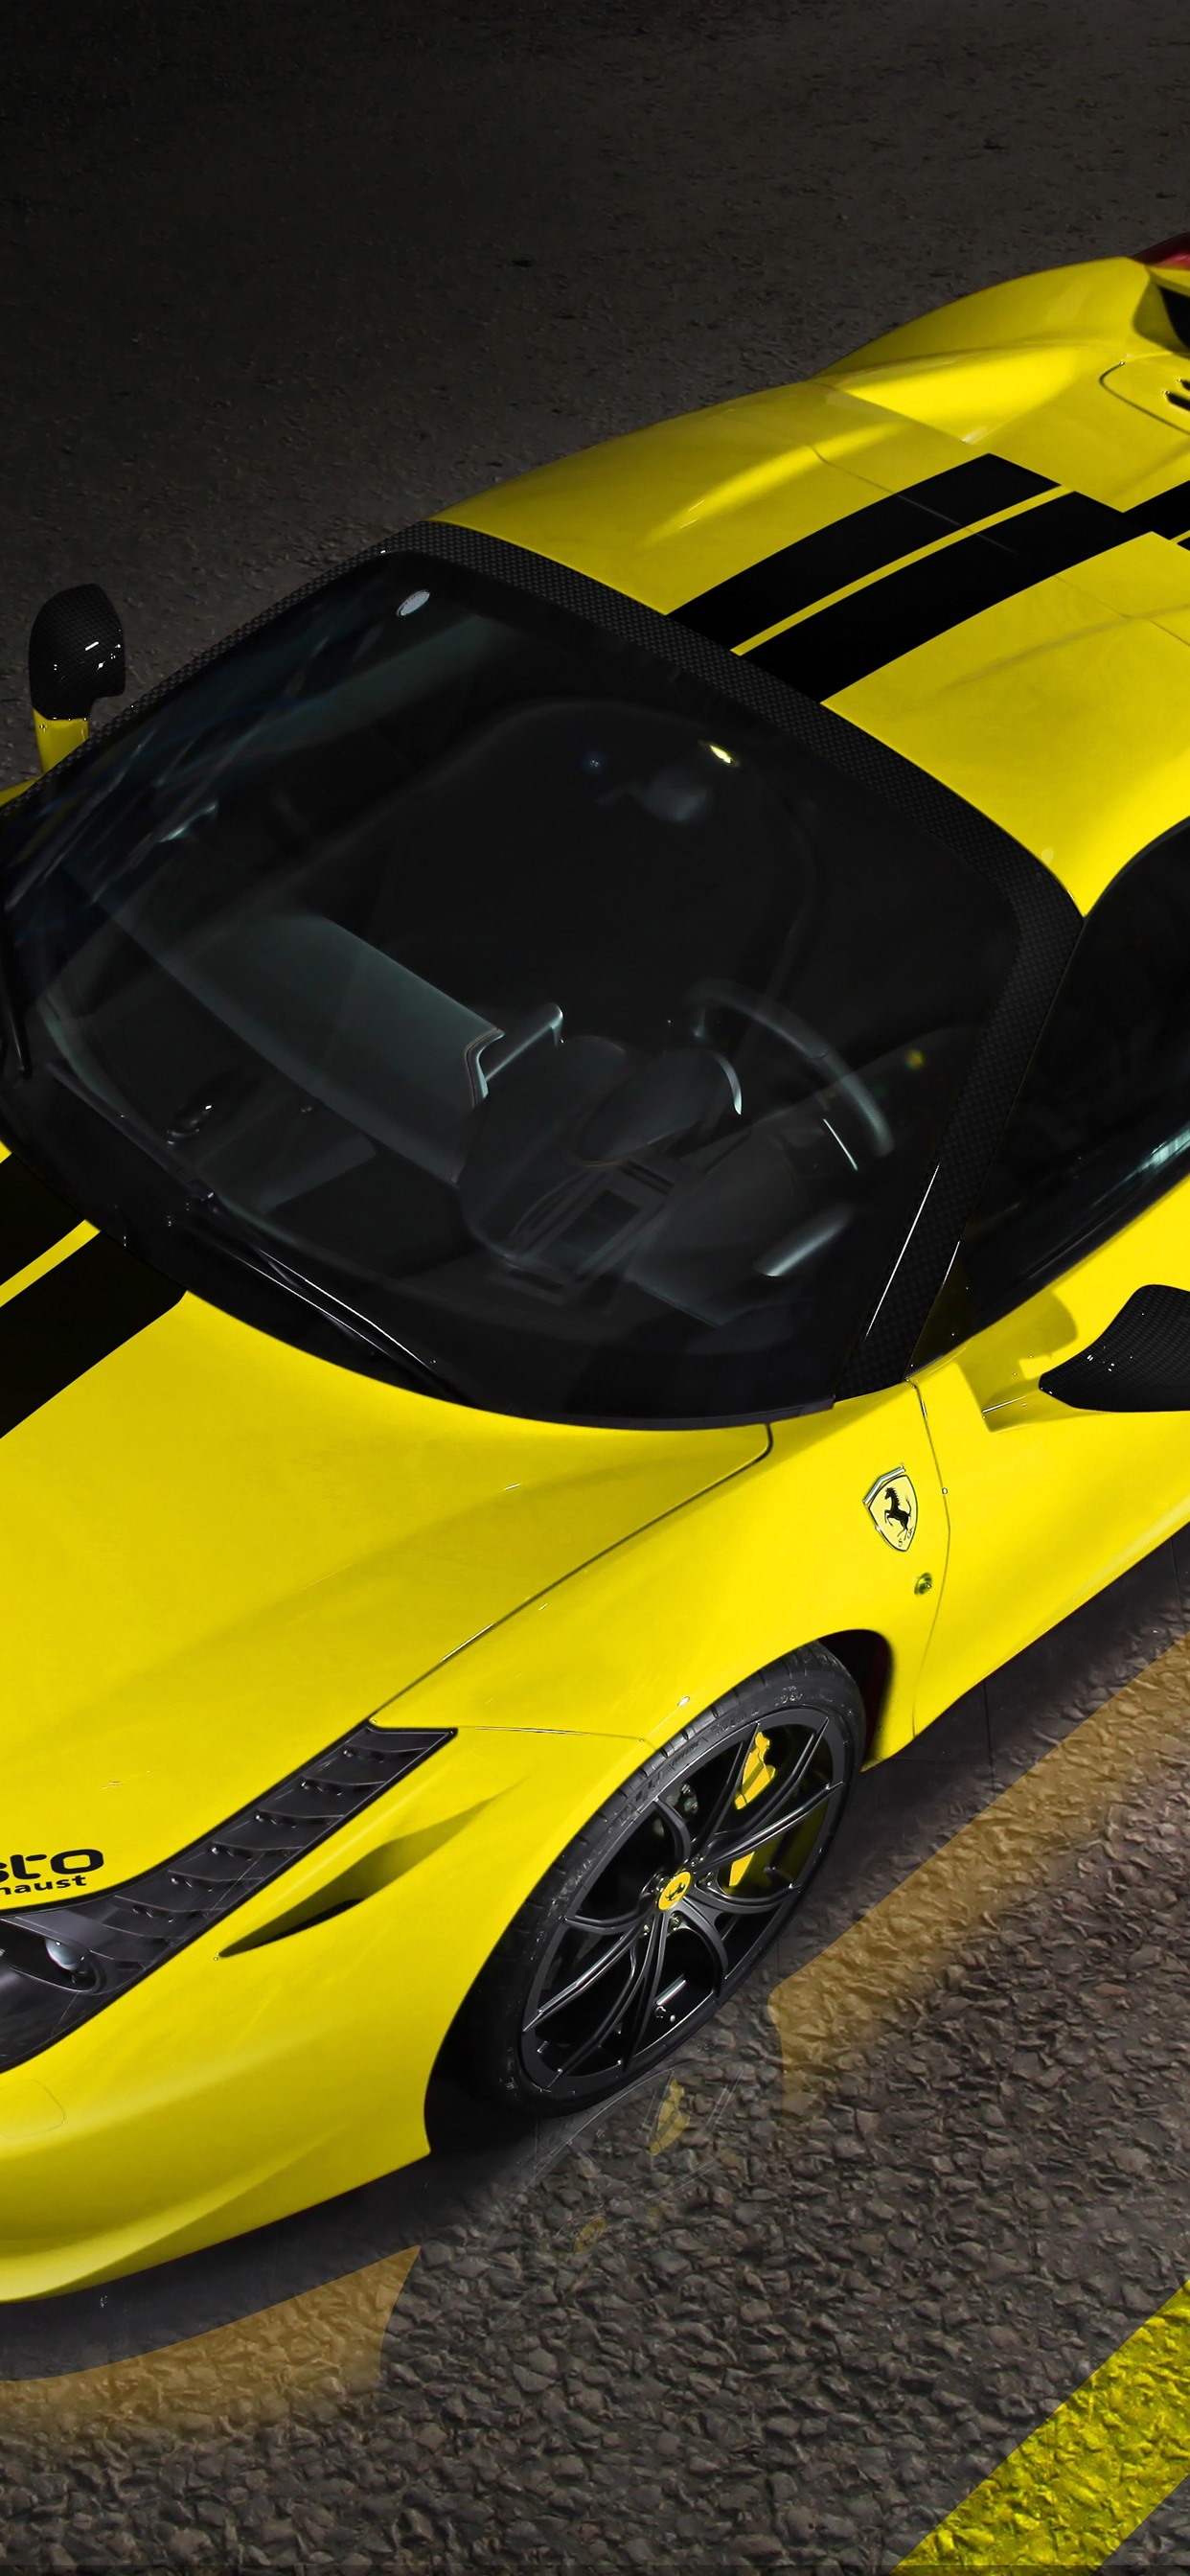 Ferrari 458 Yellow Supercar Top View 1242x2688 Iphone Xs Max